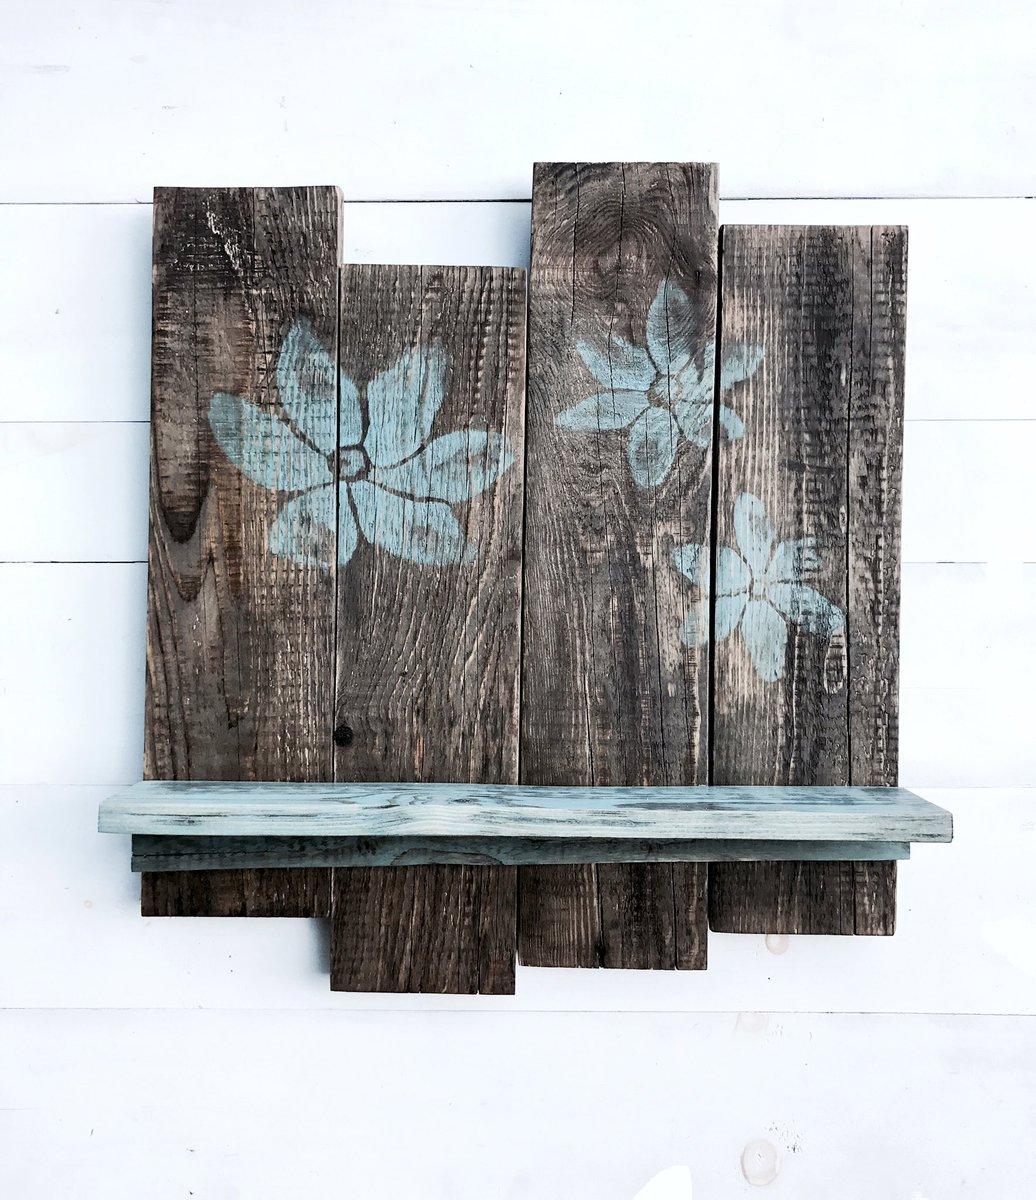 Wood Stained Flower Pallet Shelf  https://www. etsy.com/listing/545180 041/rustic-wood-shelfreclaimed-pallet?ref=shop_home_feat_4 &nbsp; …  #shelfie #Rustic #flower #art #Decor #EtsySeller #Floral #wallart #handmade #wood <br>http://pic.twitter.com/pFrbMpsGbw